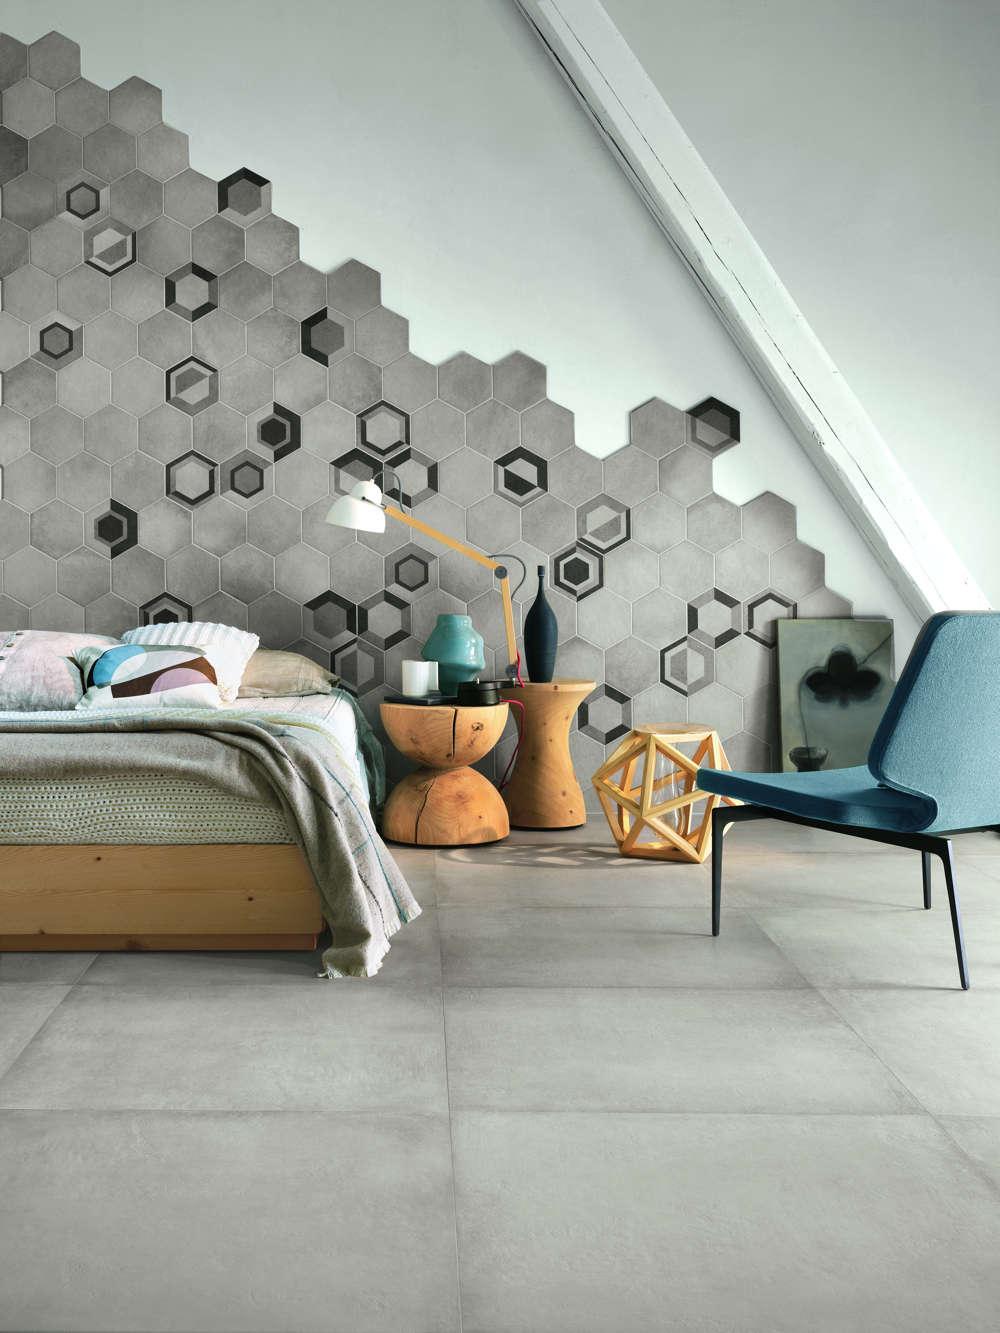 Leicester Wall Tiles Rewind Hexagon